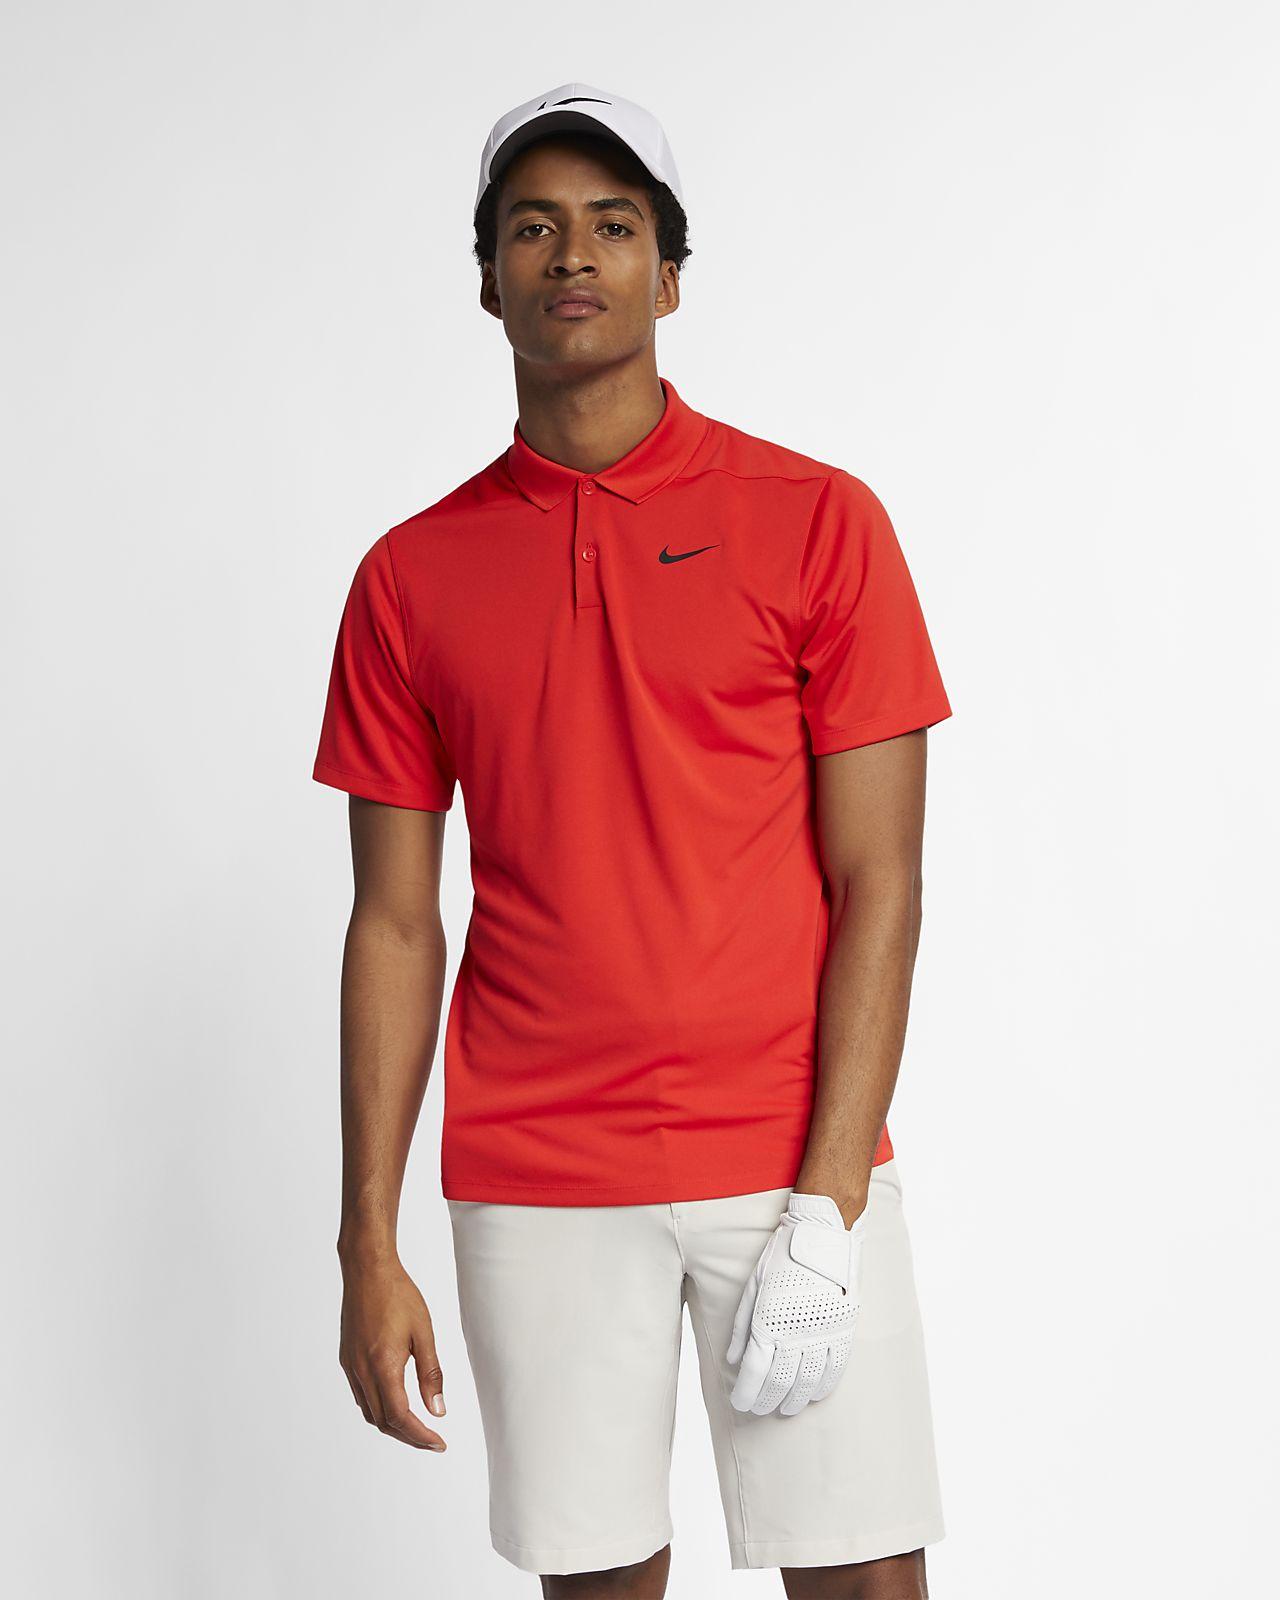 Nike Dri-FIT Victory Herren-Golf-Poloshirt